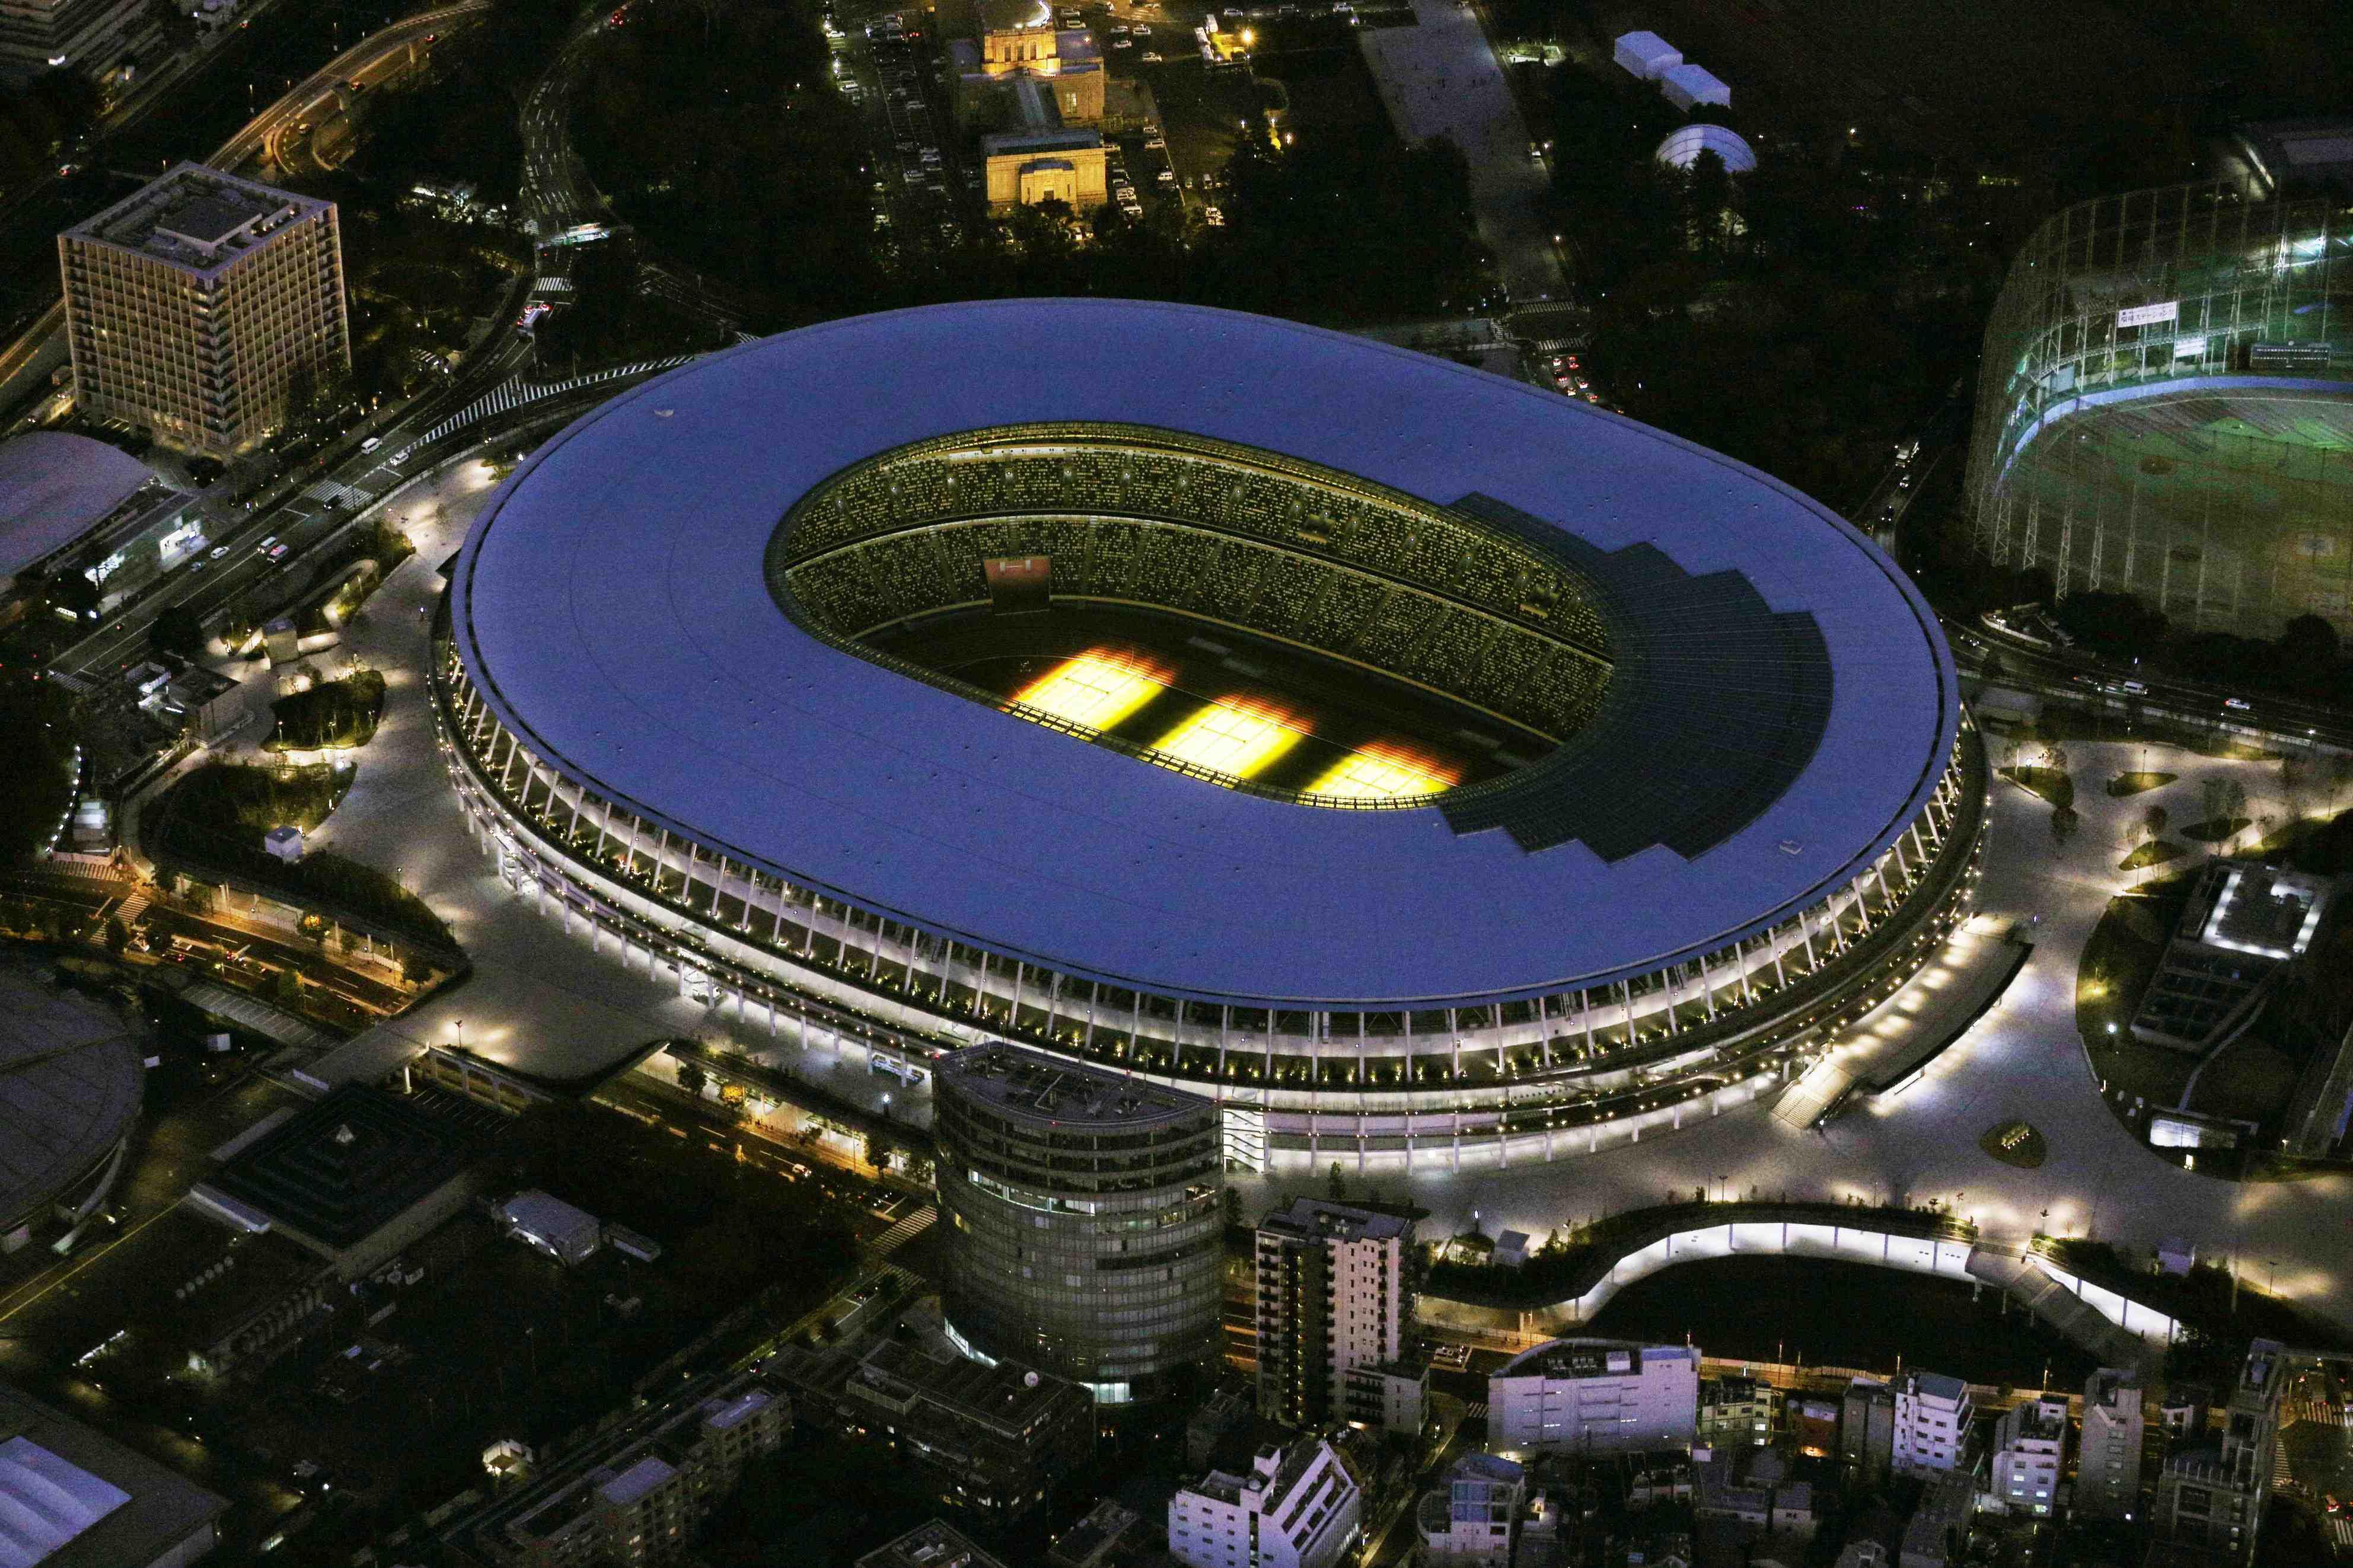 Japan New National Stadium Tokyo Olympics 2020 035